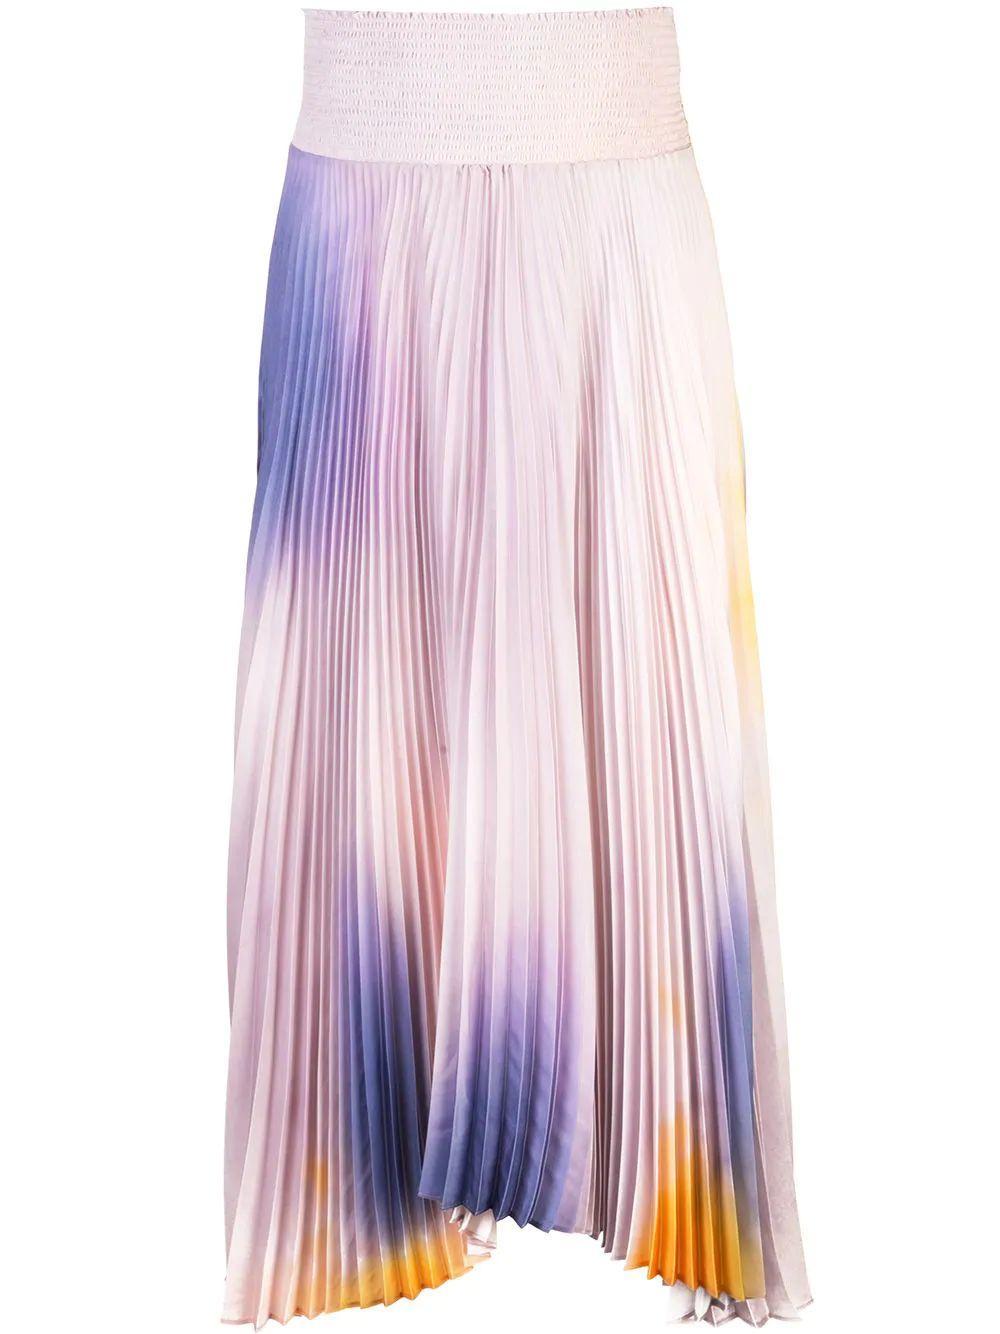 Sonali Tie Dye Pleated Midi Skirt Item # 3SKRT00158